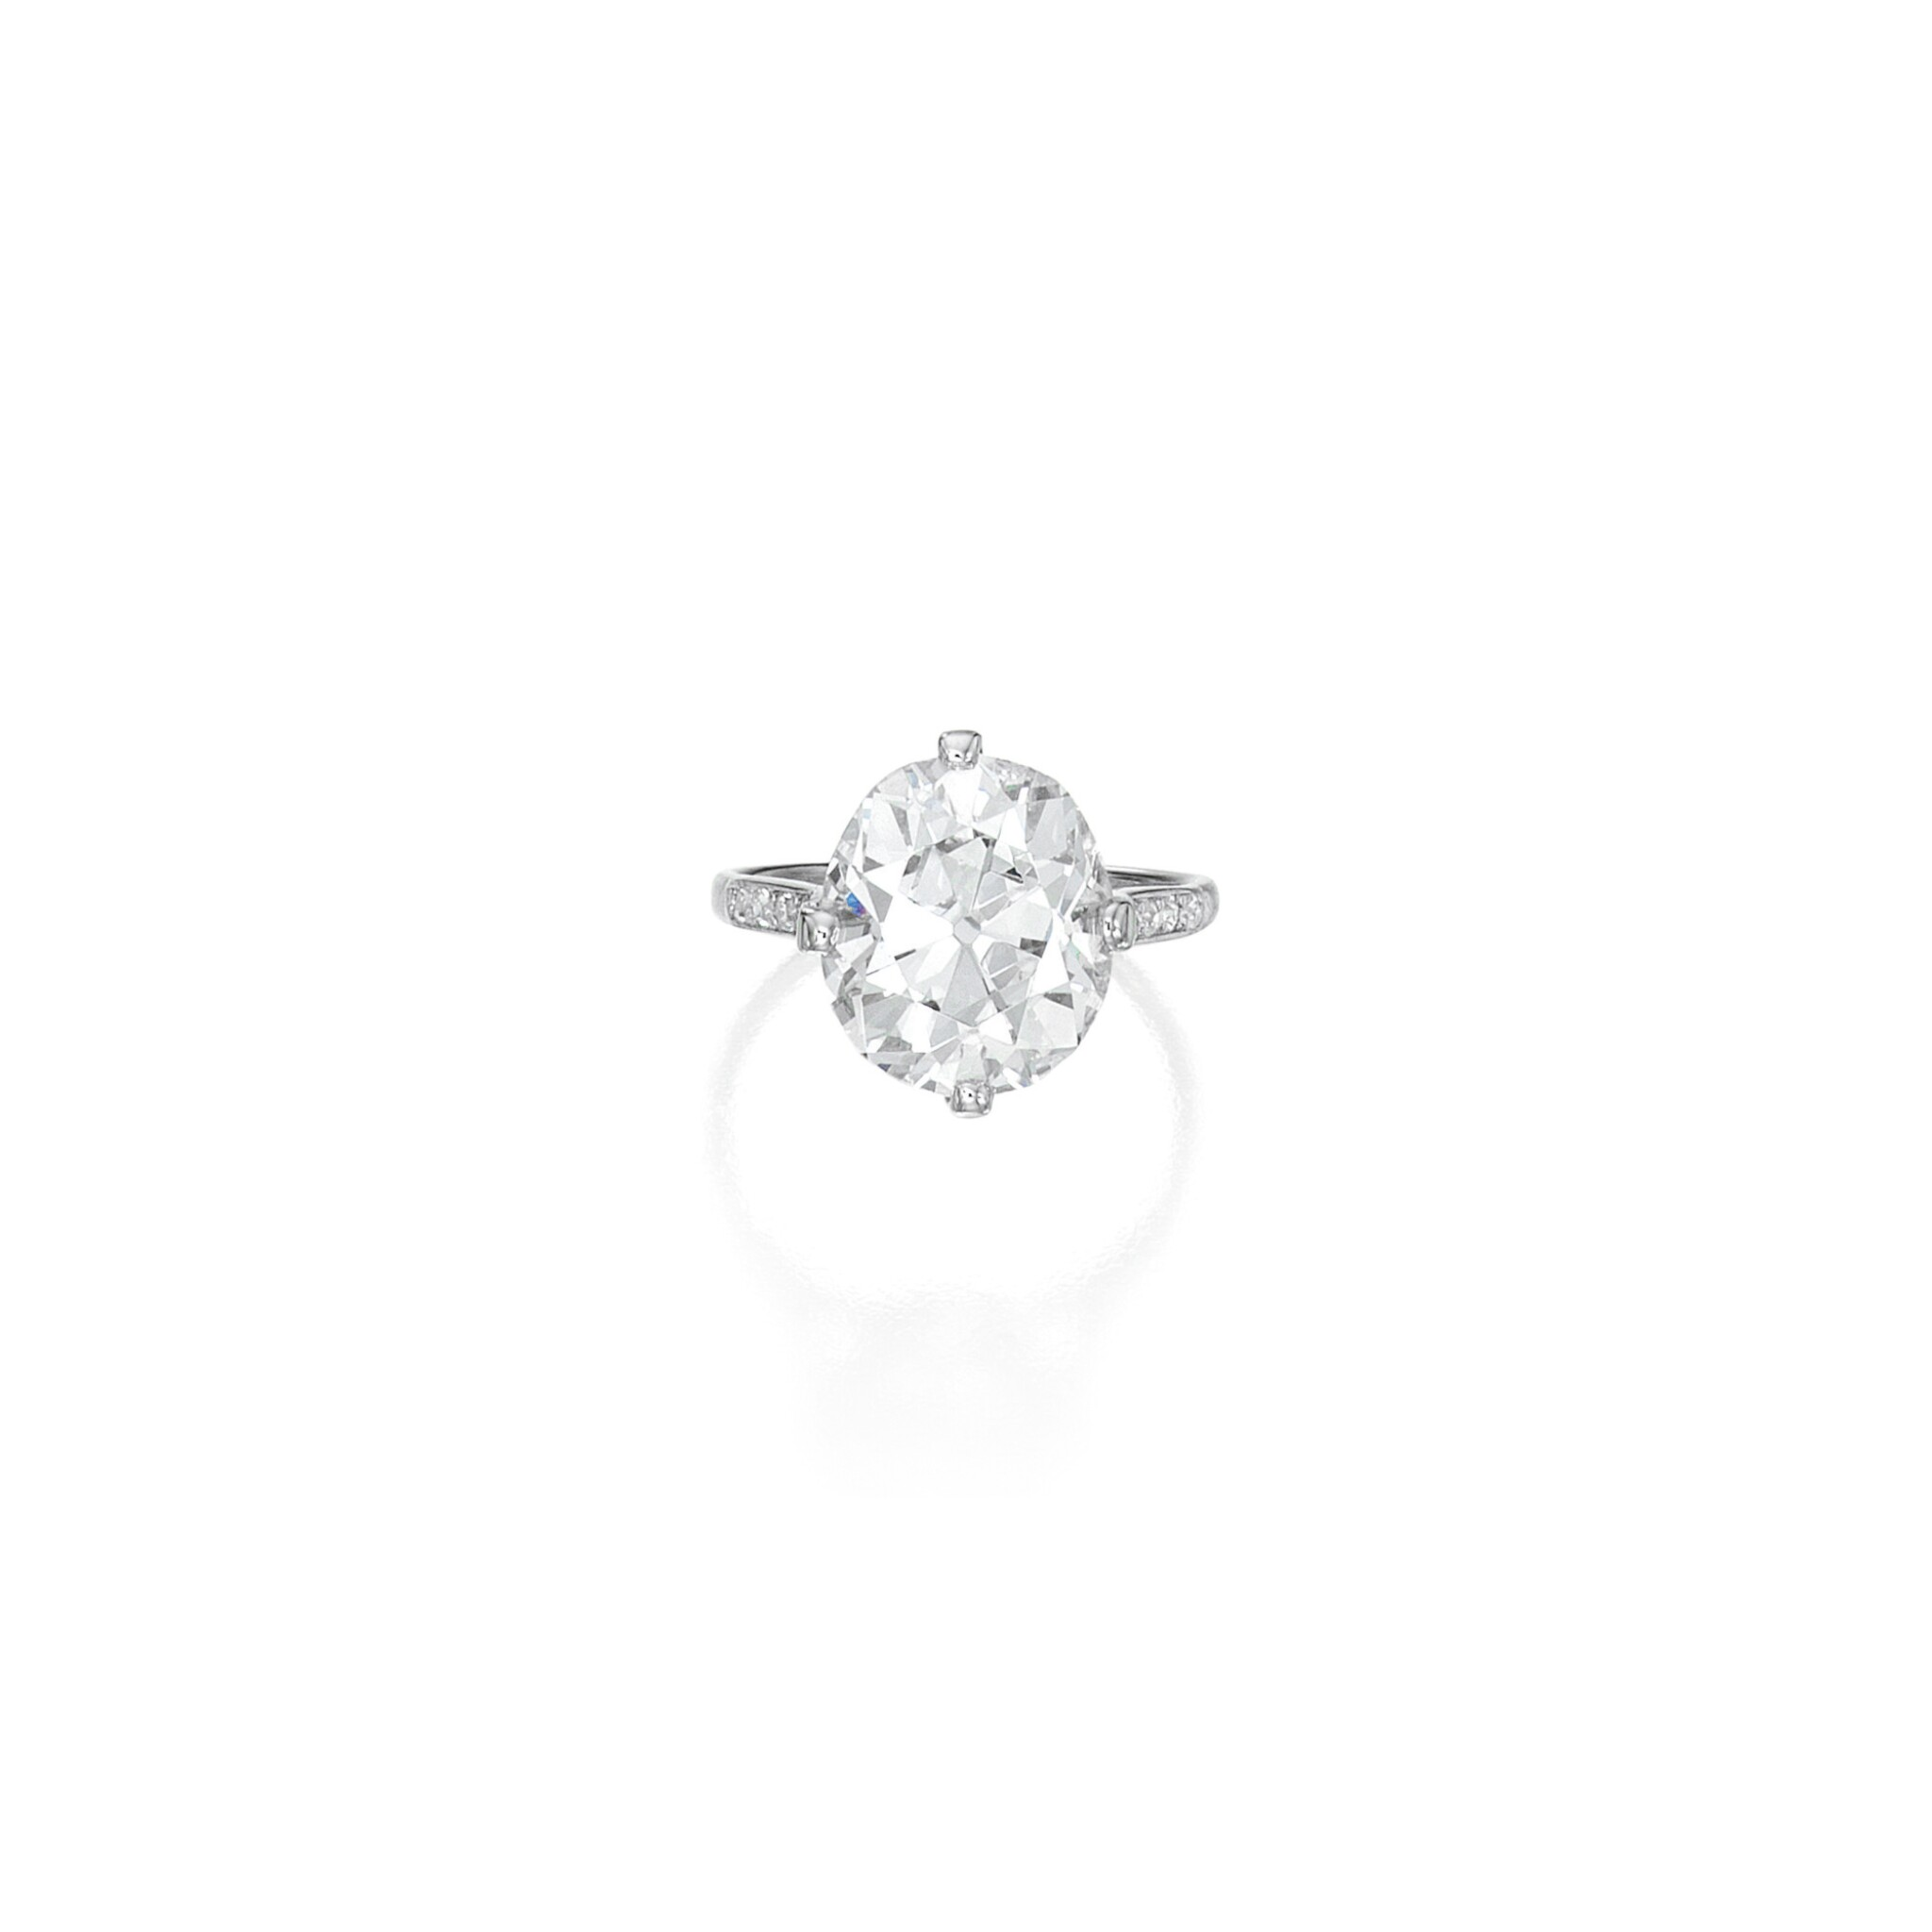 View full screen - View 1 of Lot 503. DIAMOND RING, CARTIER | 鑽石戒指,卡地亞.